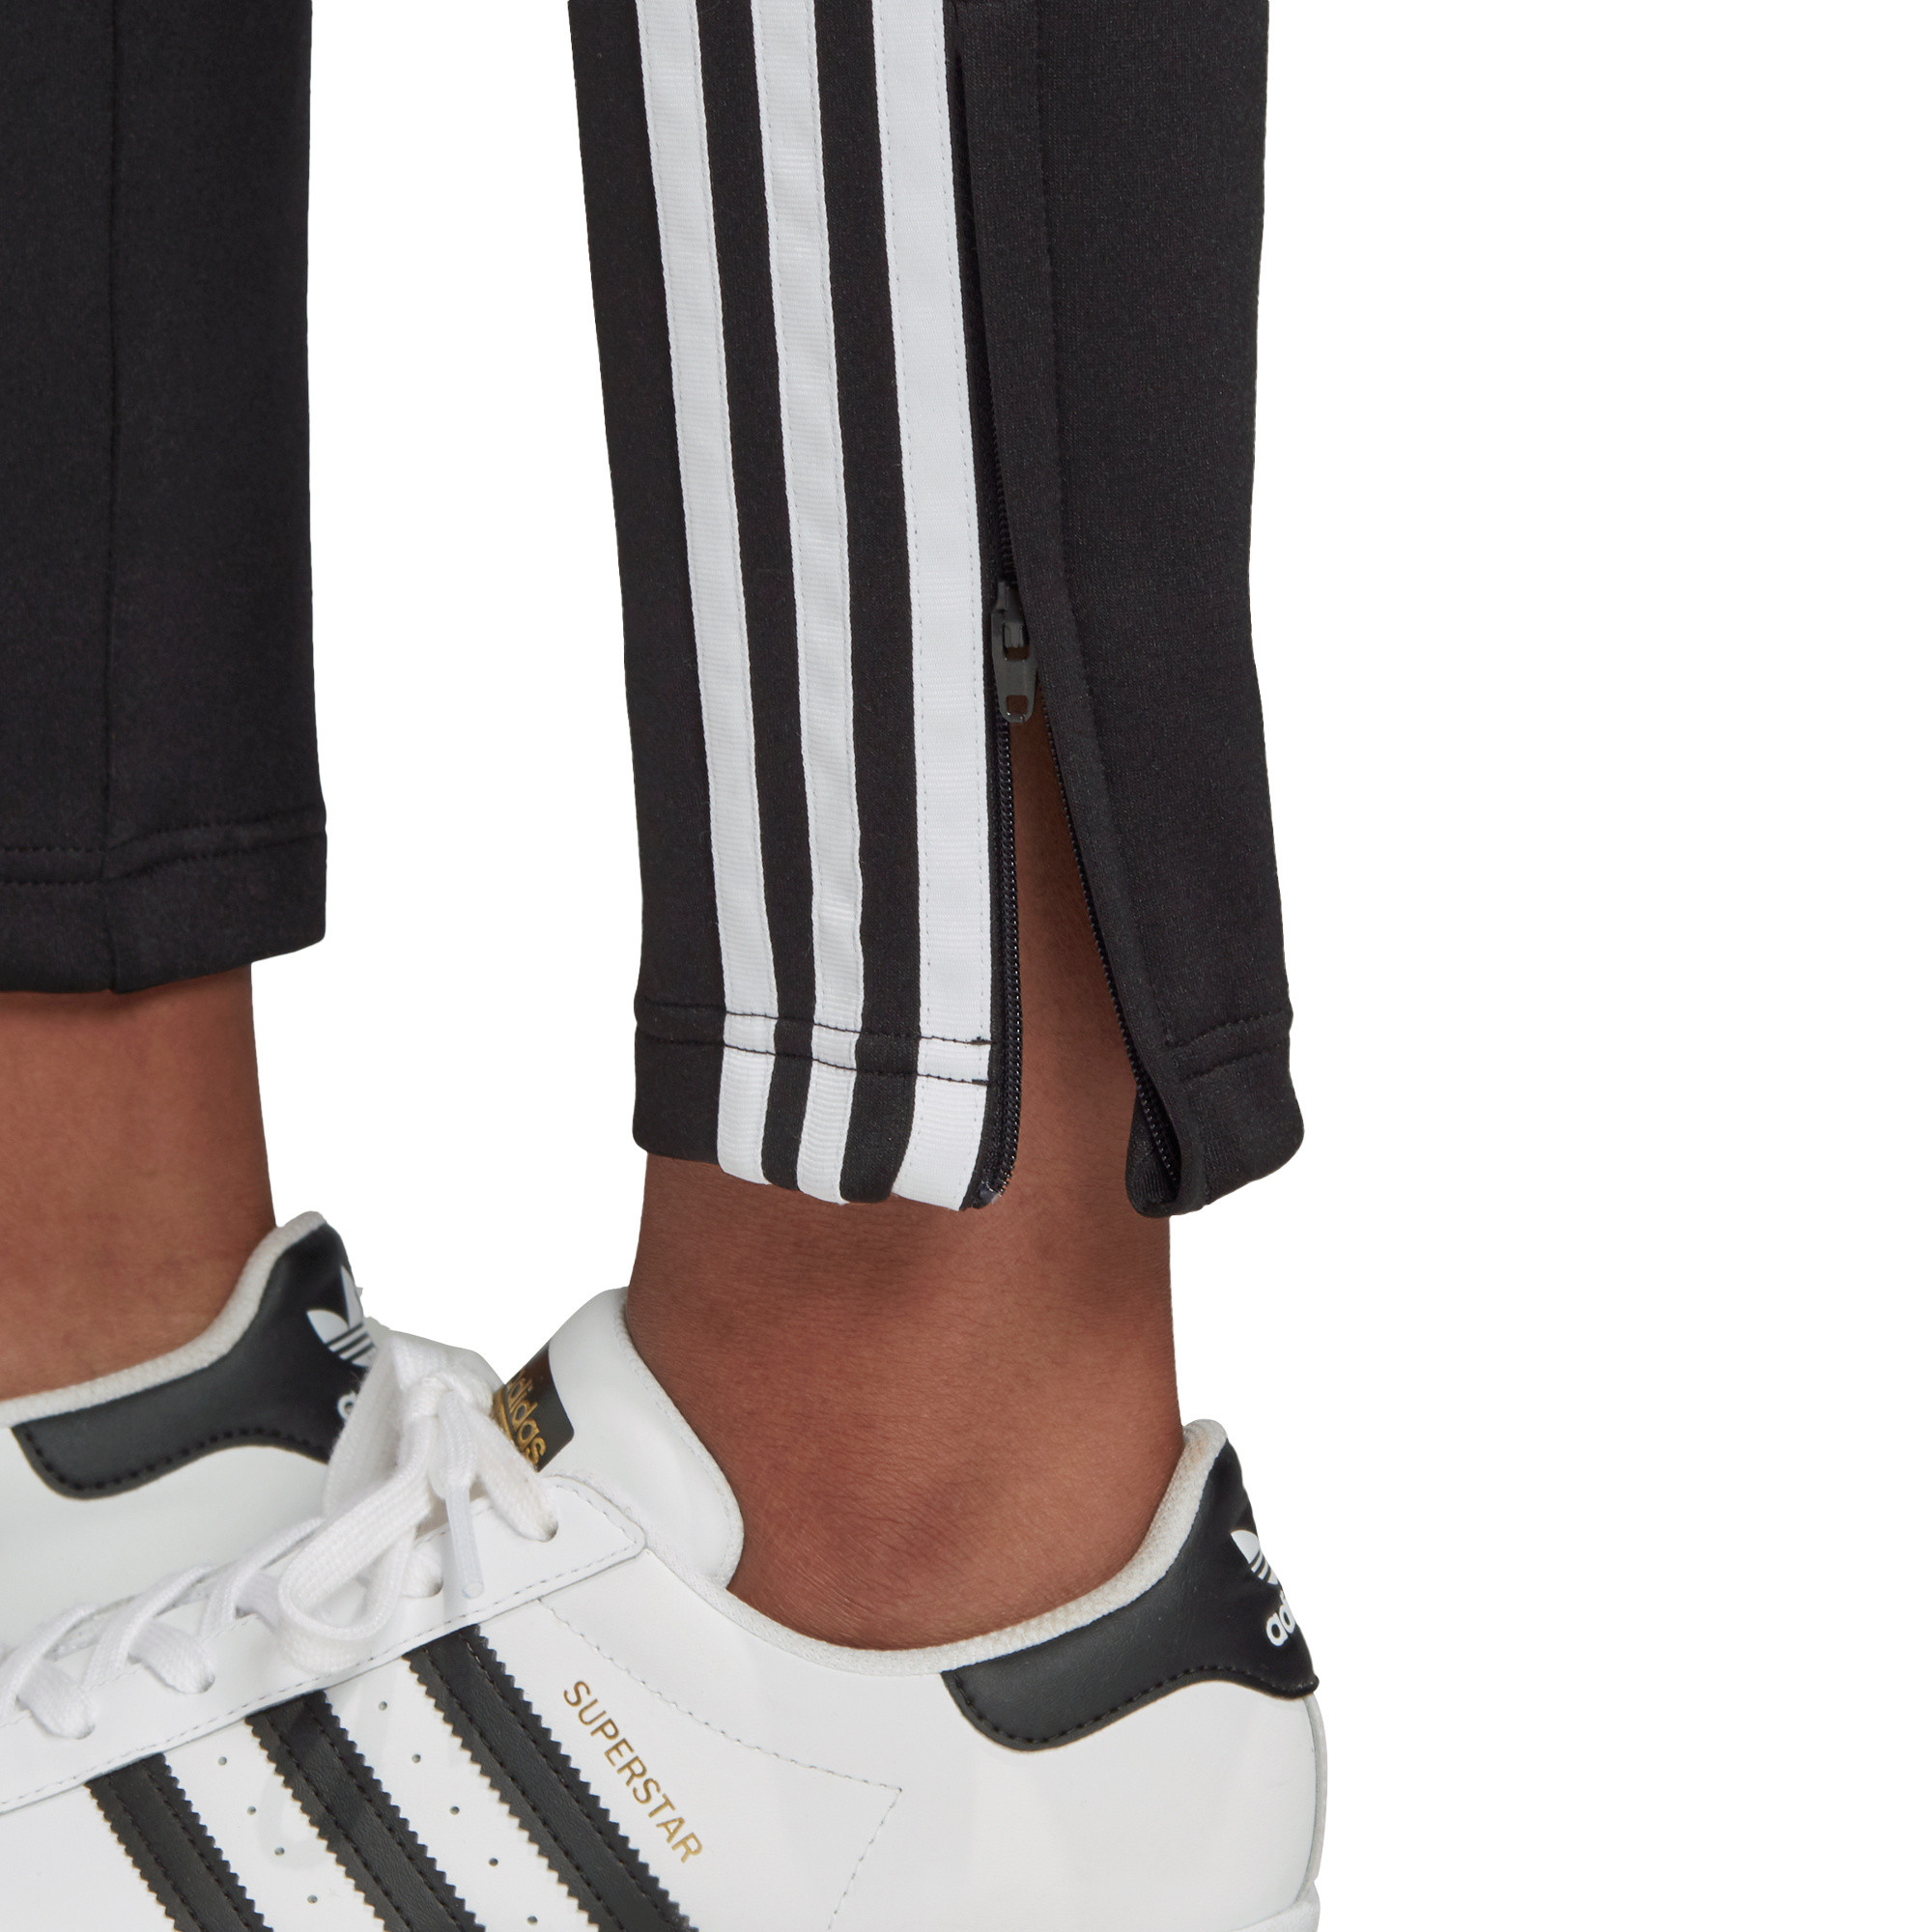 Pantaloni tuta Primeblue SST, Bianco/Nero, large image number 3